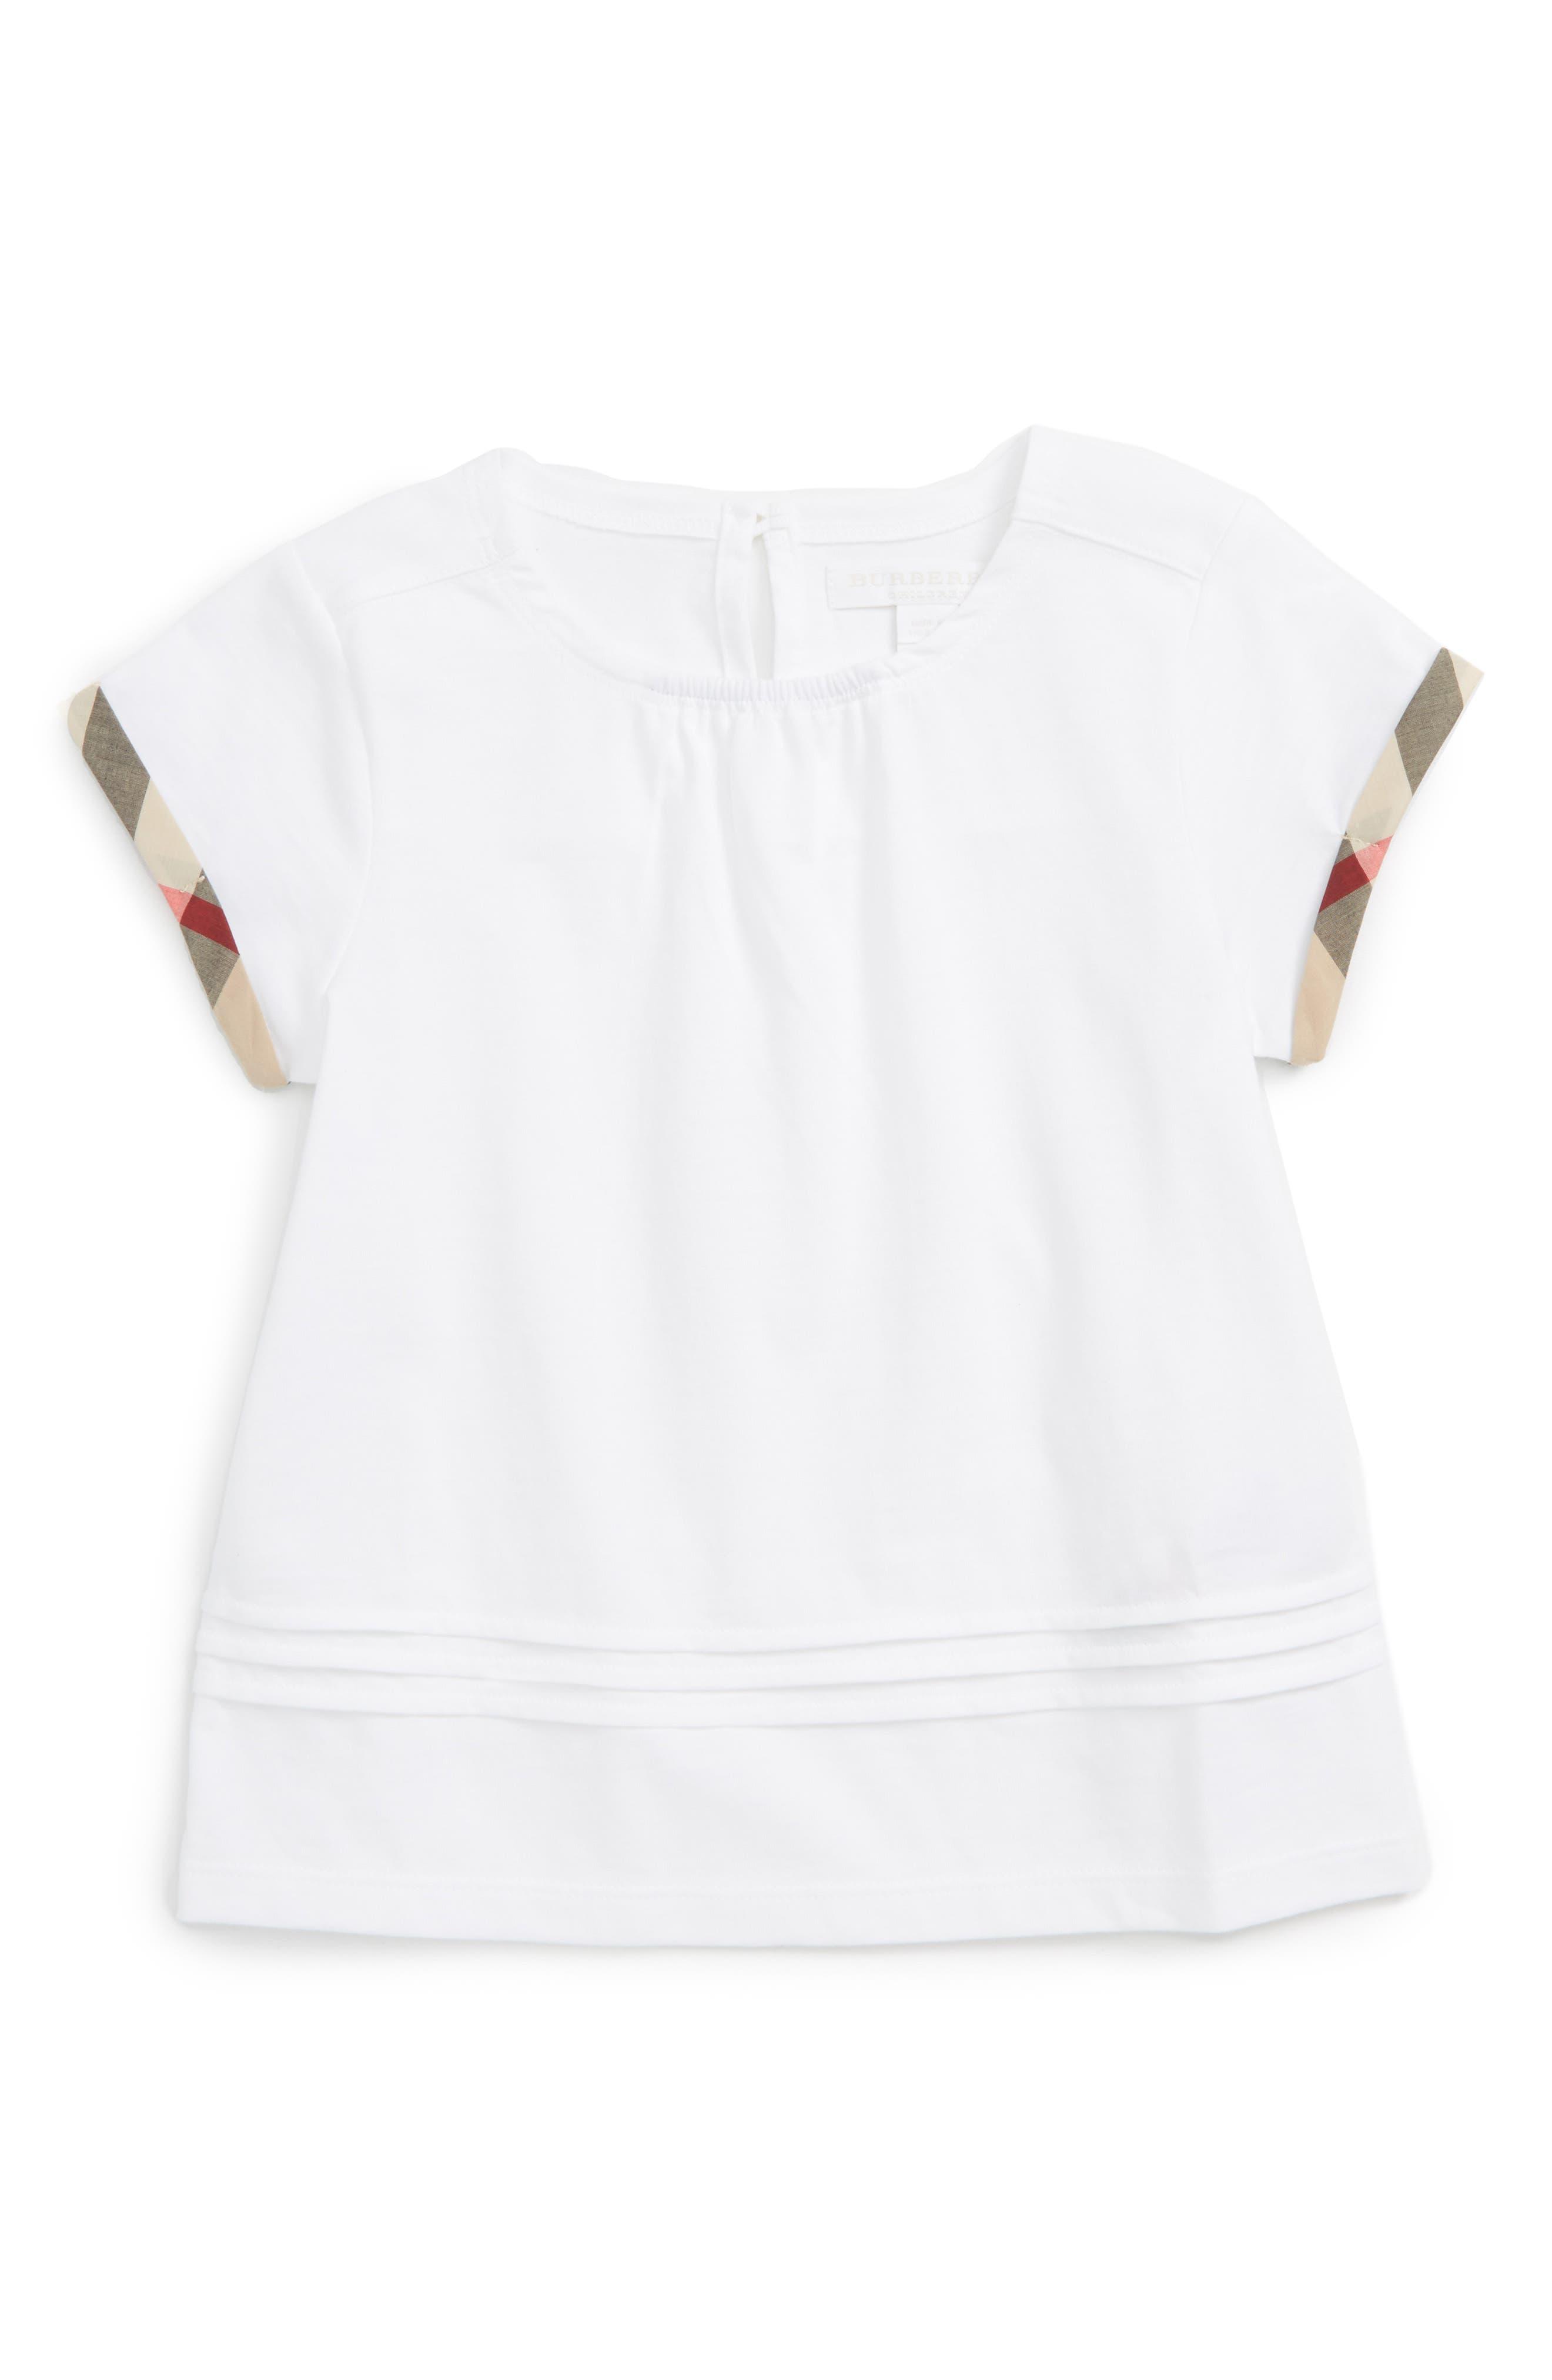 Gisselle Shirt,                             Main thumbnail 1, color,                             100